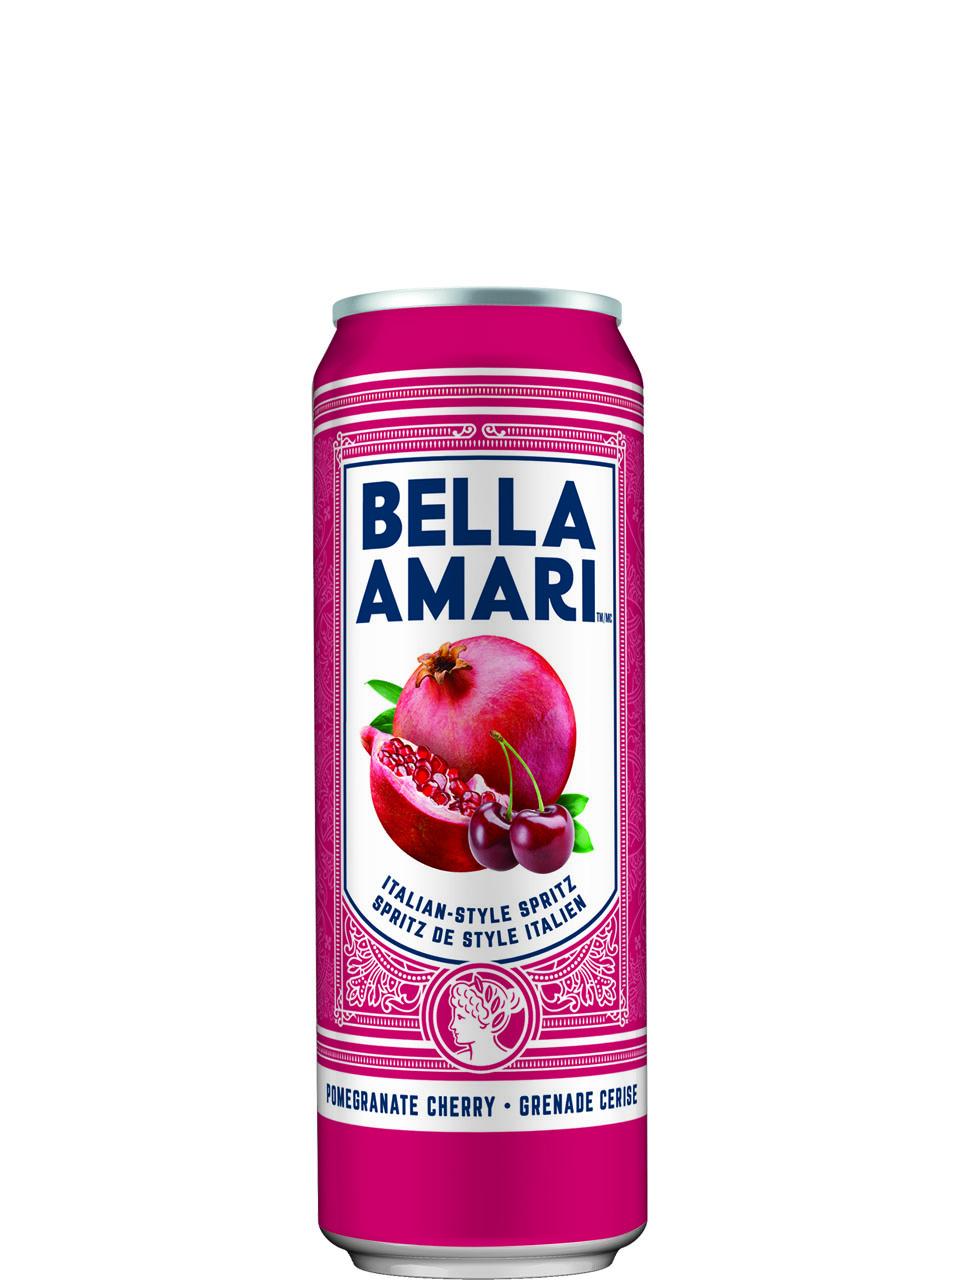 Bella Amari Pomegranate Cherry 4pk Cans